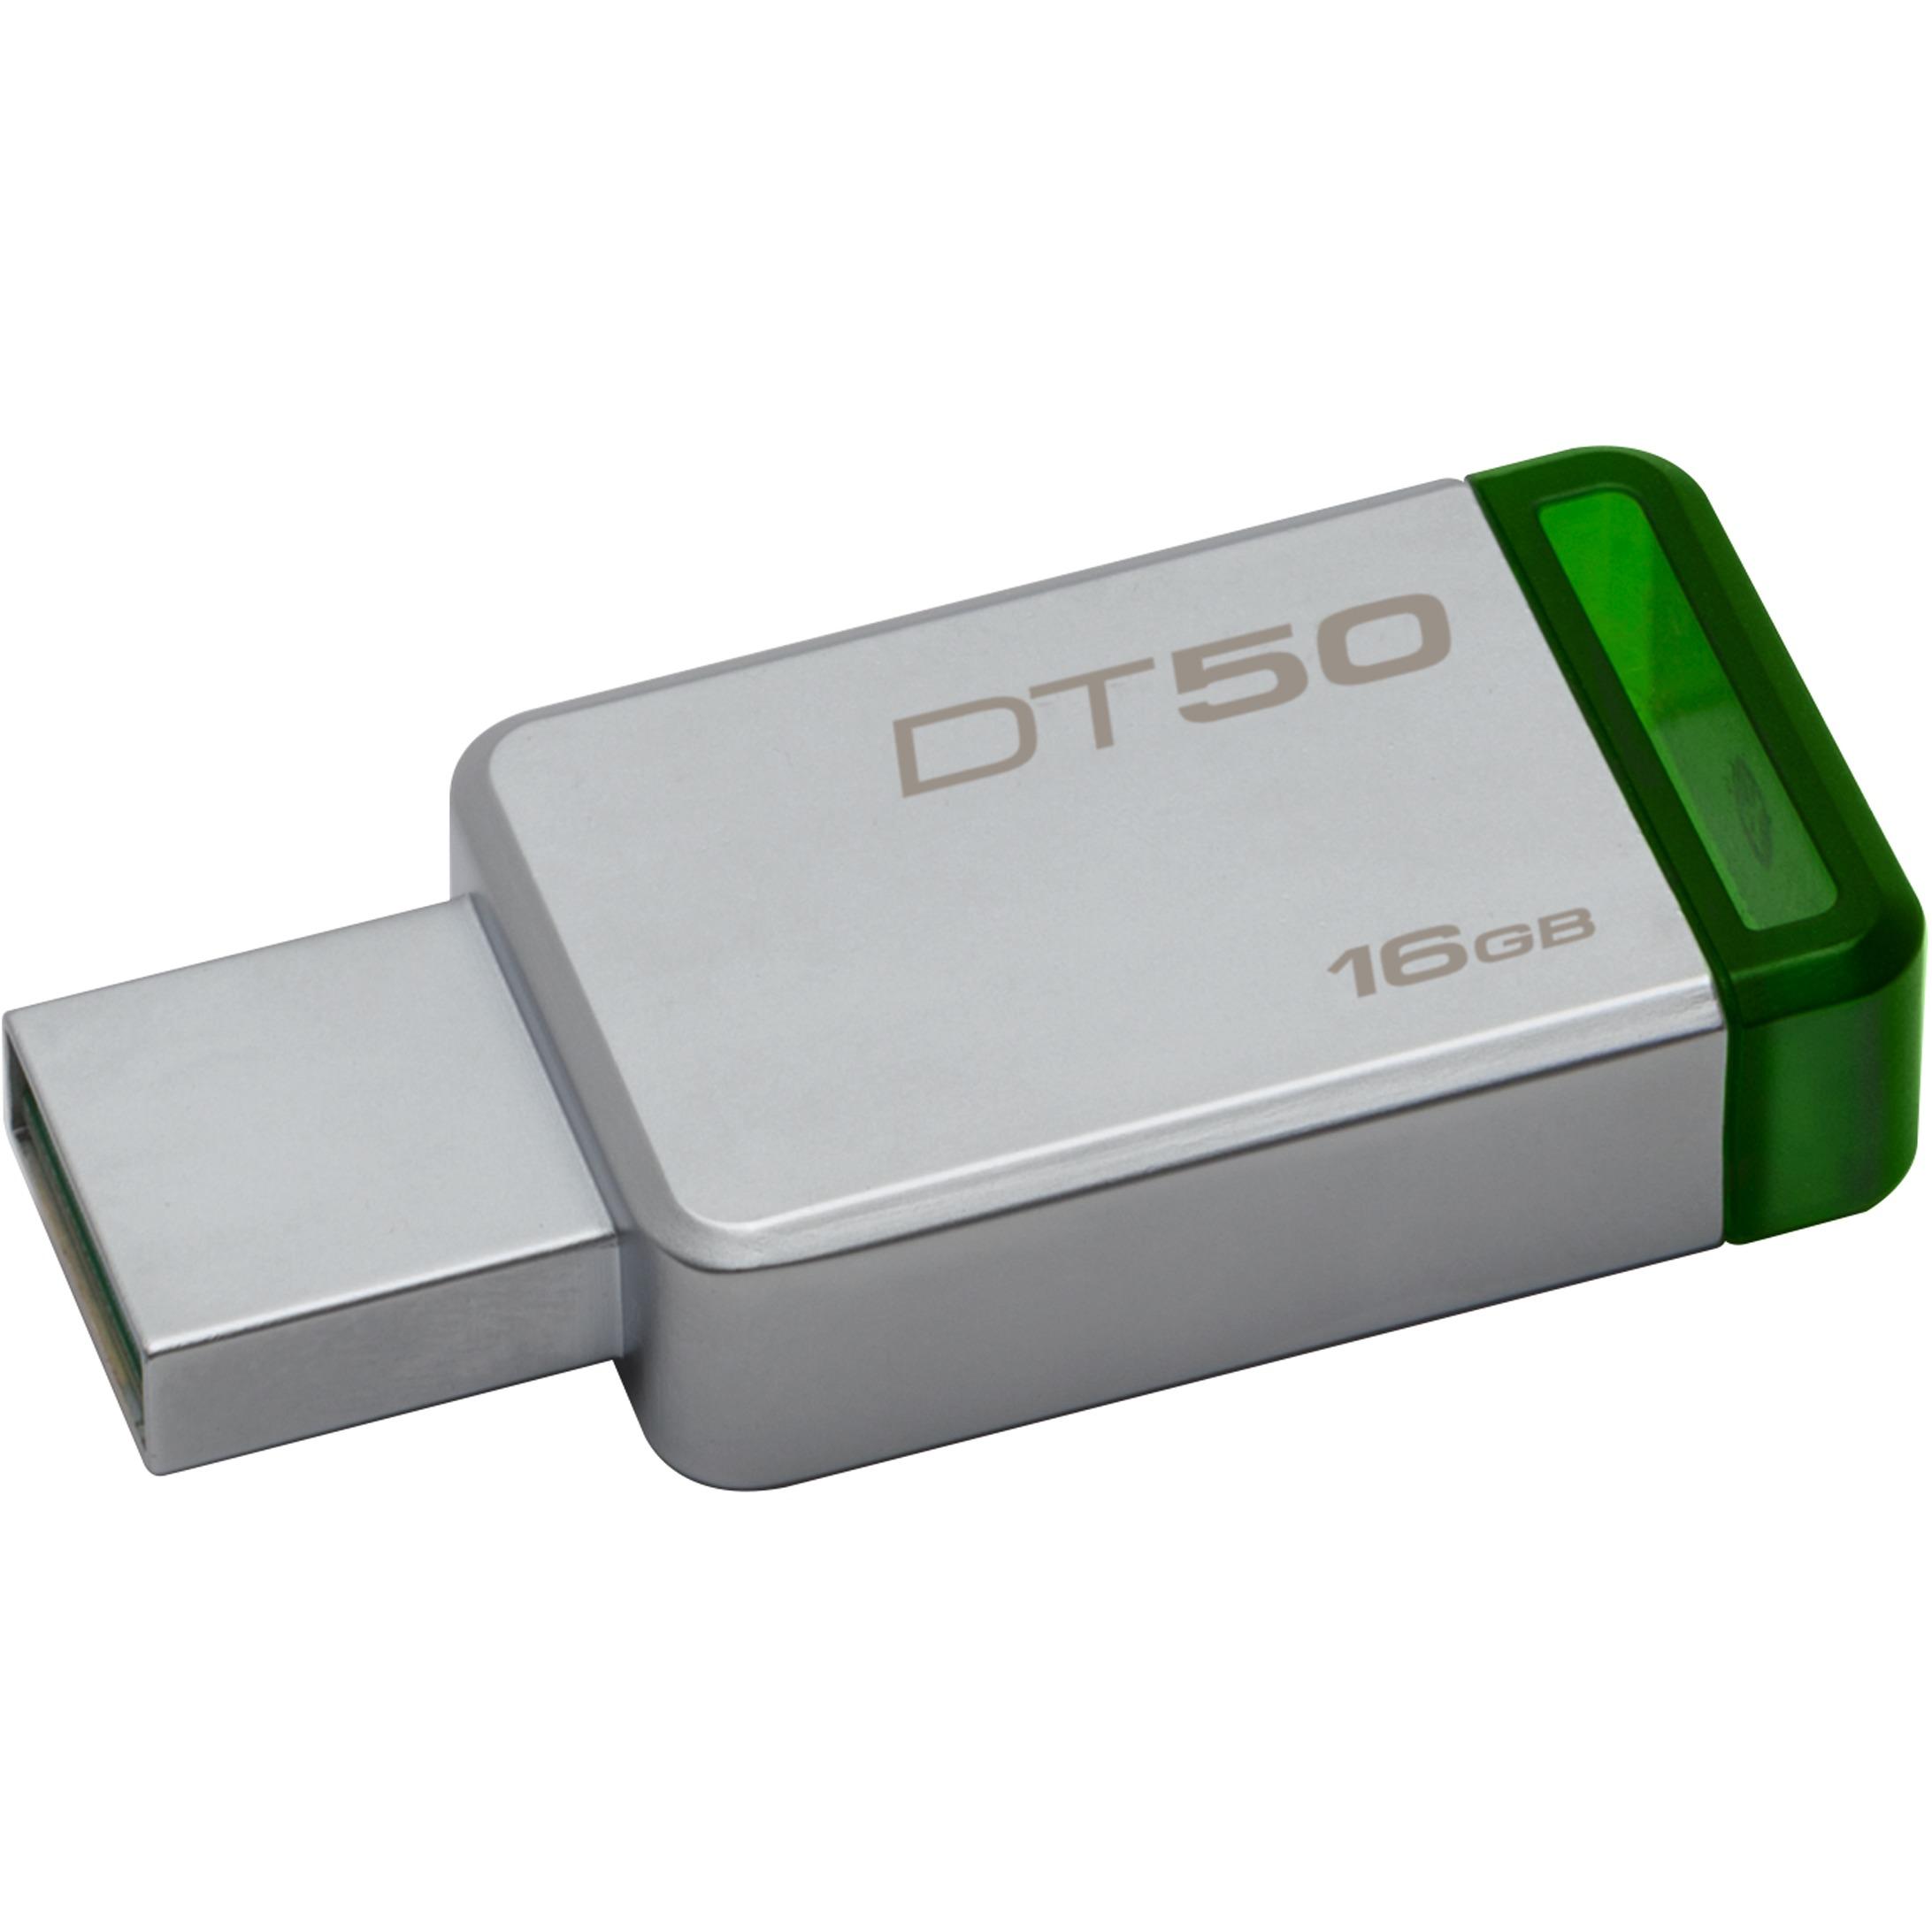 Kingston 16GB DataTraveler 50 16G DT50 USB 3.1 Gen 1 USB 3.0 30MB/s Flash Pen Thumb Drive DT50/16GB 0